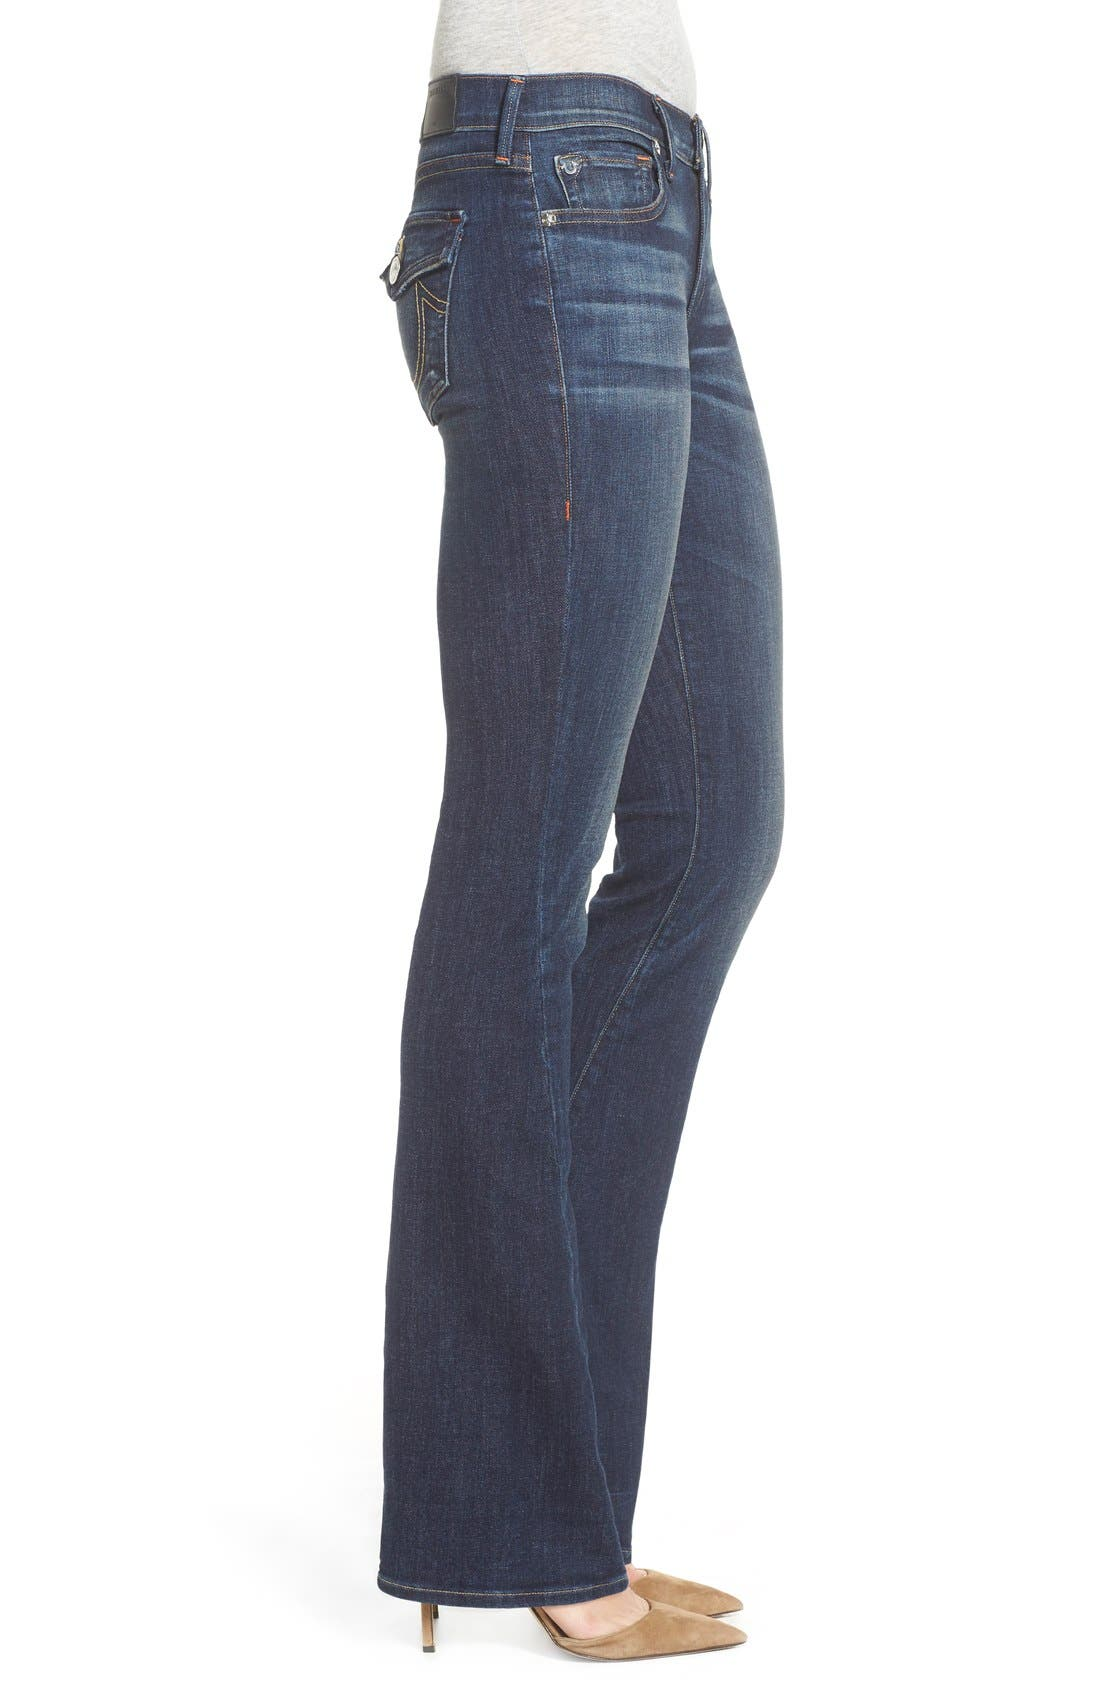 Alternate Image 3  - True Religion Brand Jeans 'Becca' Twisted Seam Bootcut Jeans (Boyfriend Wash)